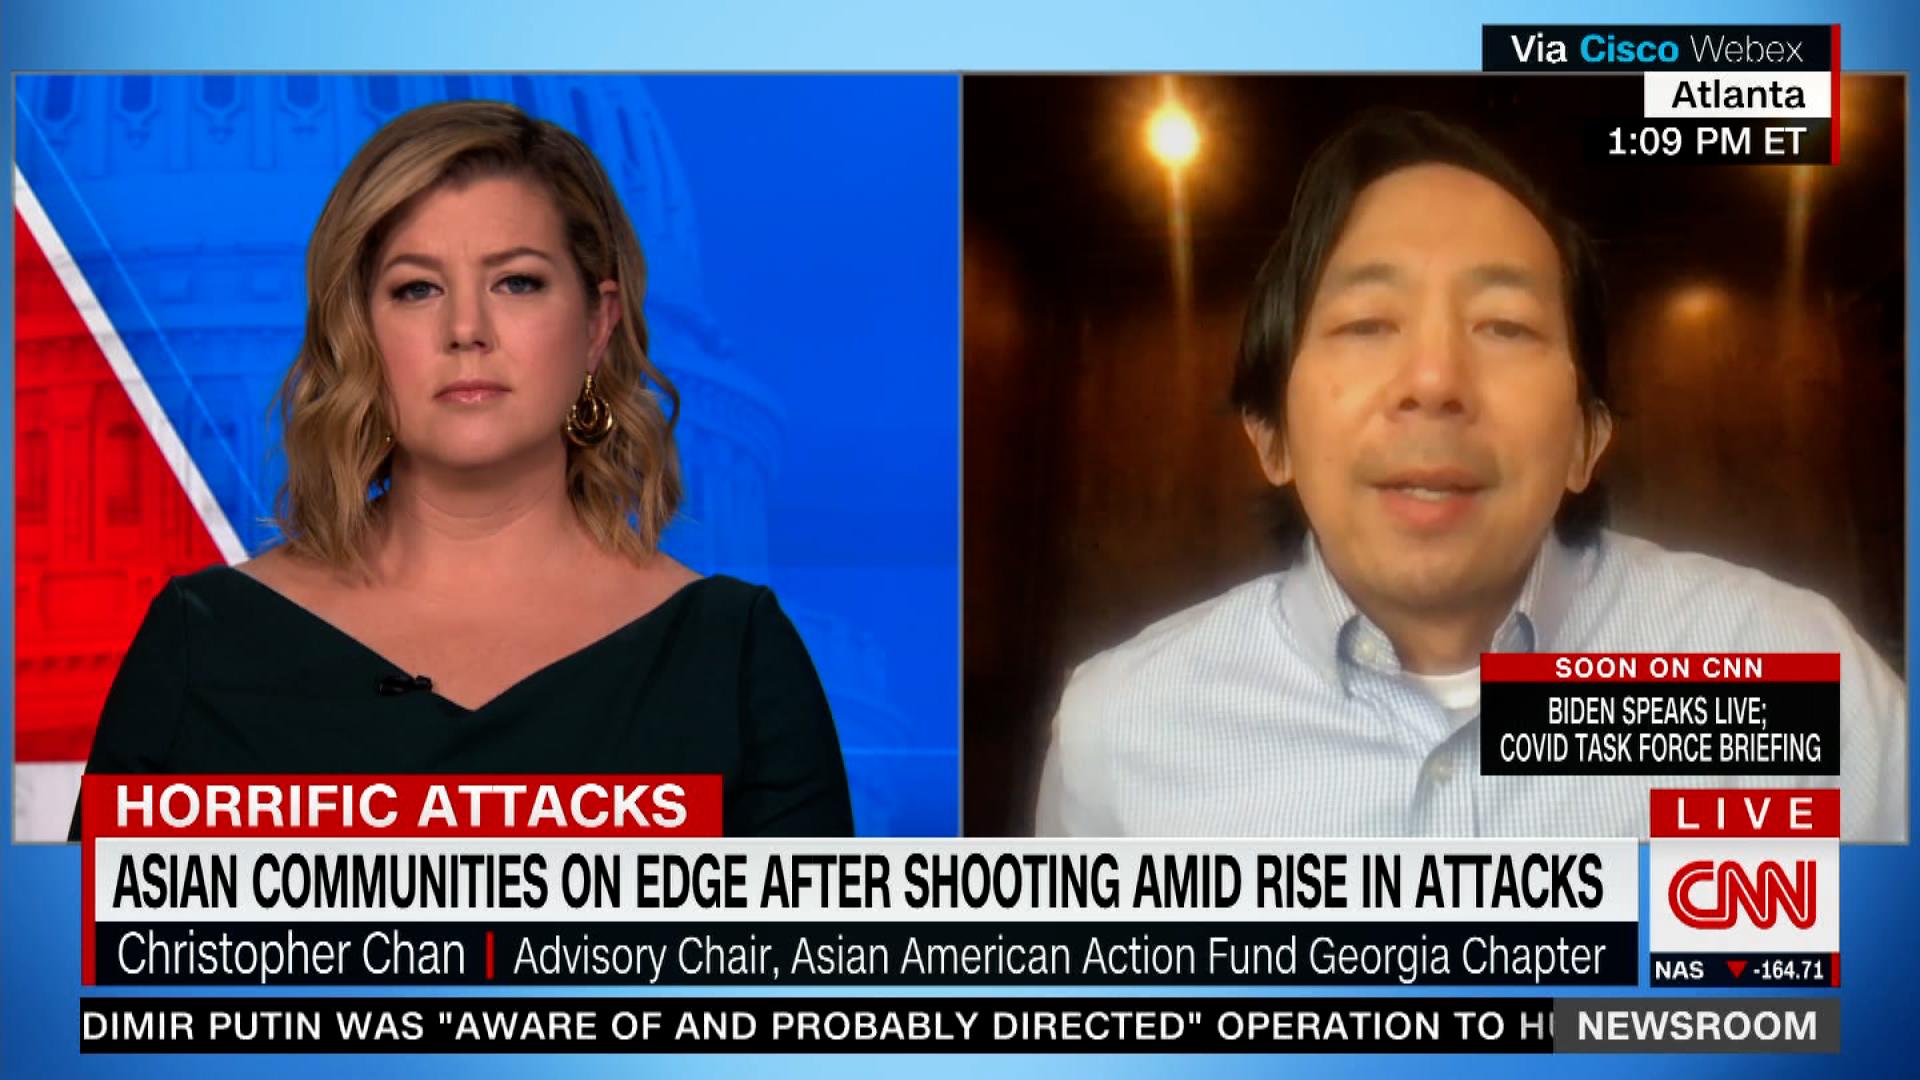 March 17 Atlanta Spa Shootings News